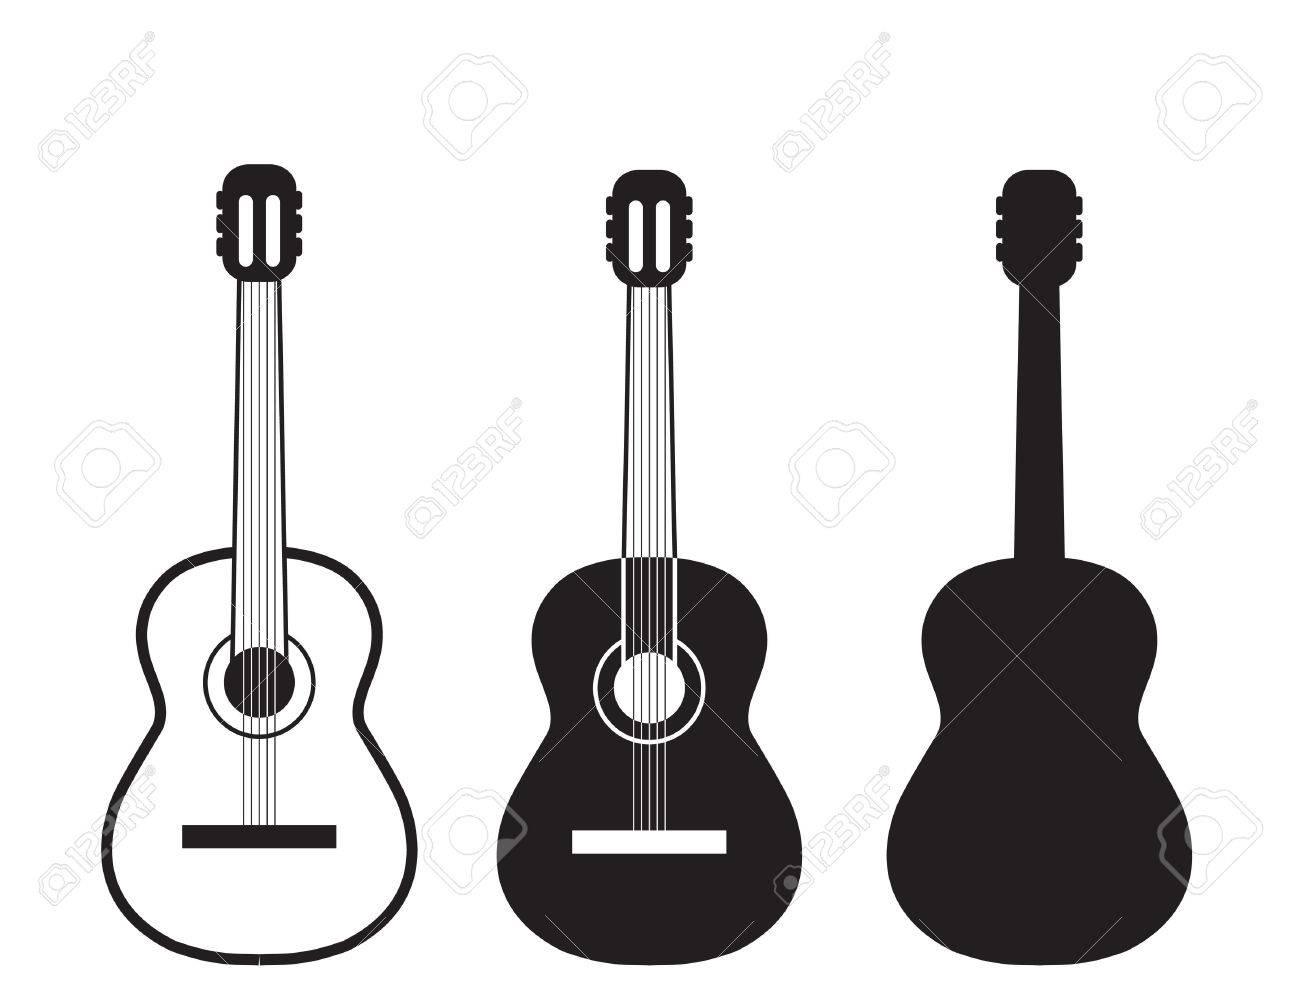 set guitars symbol royalty free cliparts vectors and stock